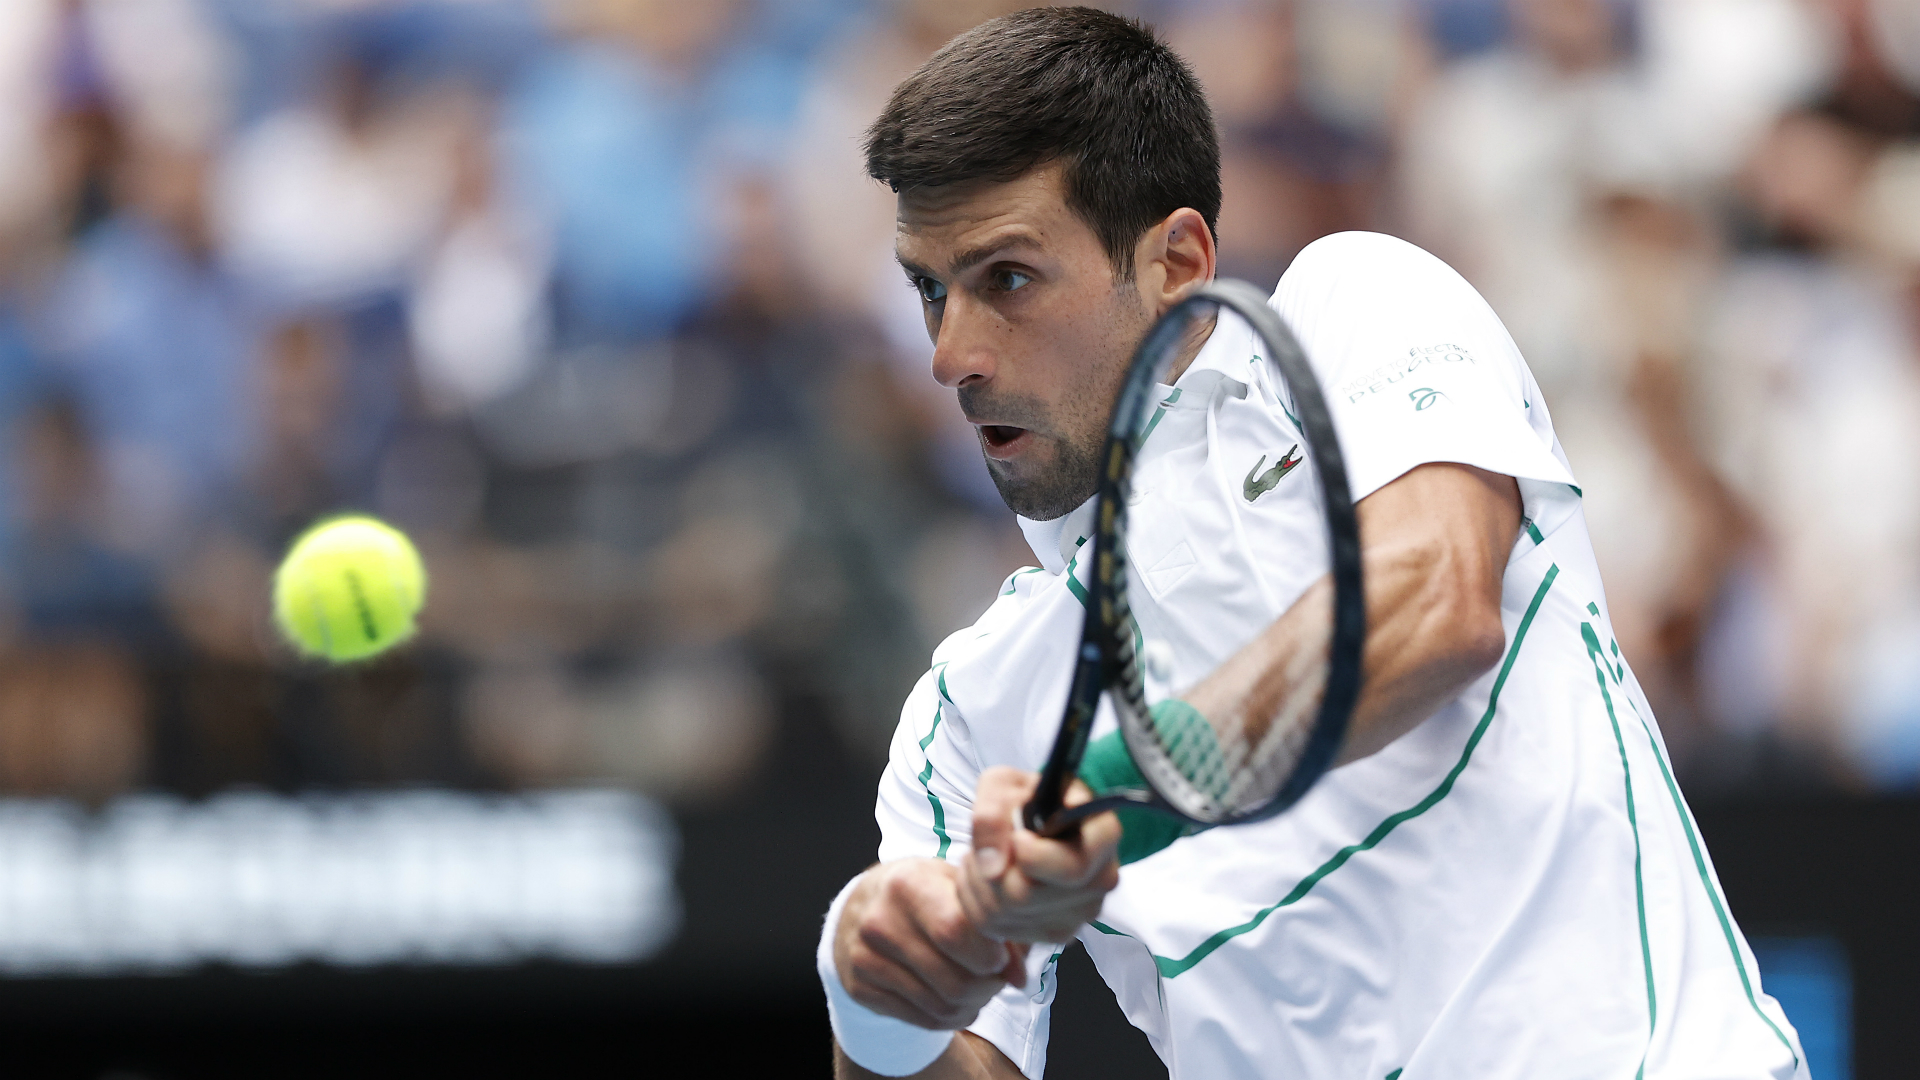 Australian Open 2020: Novak Djokovic results and form ahead of third-round match with Yoshihito Nishioka